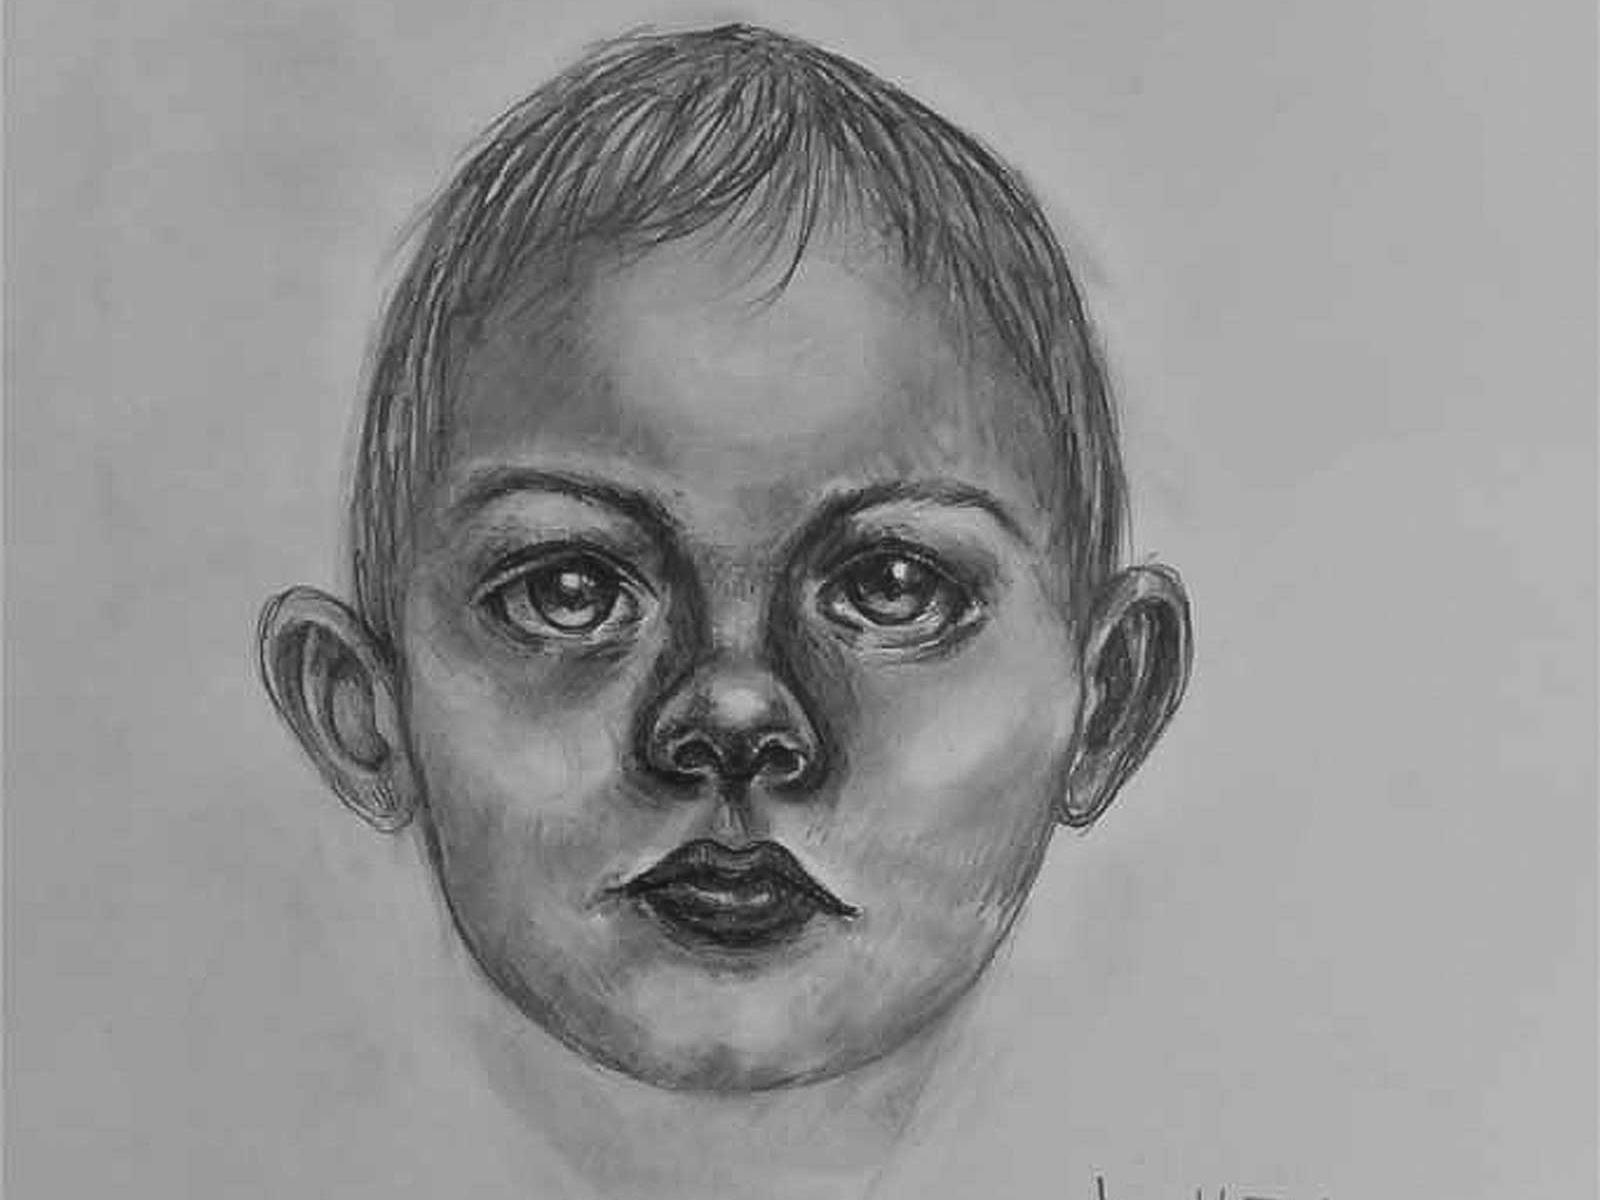 Horror baby drawing sketching karakalem by hediyelik